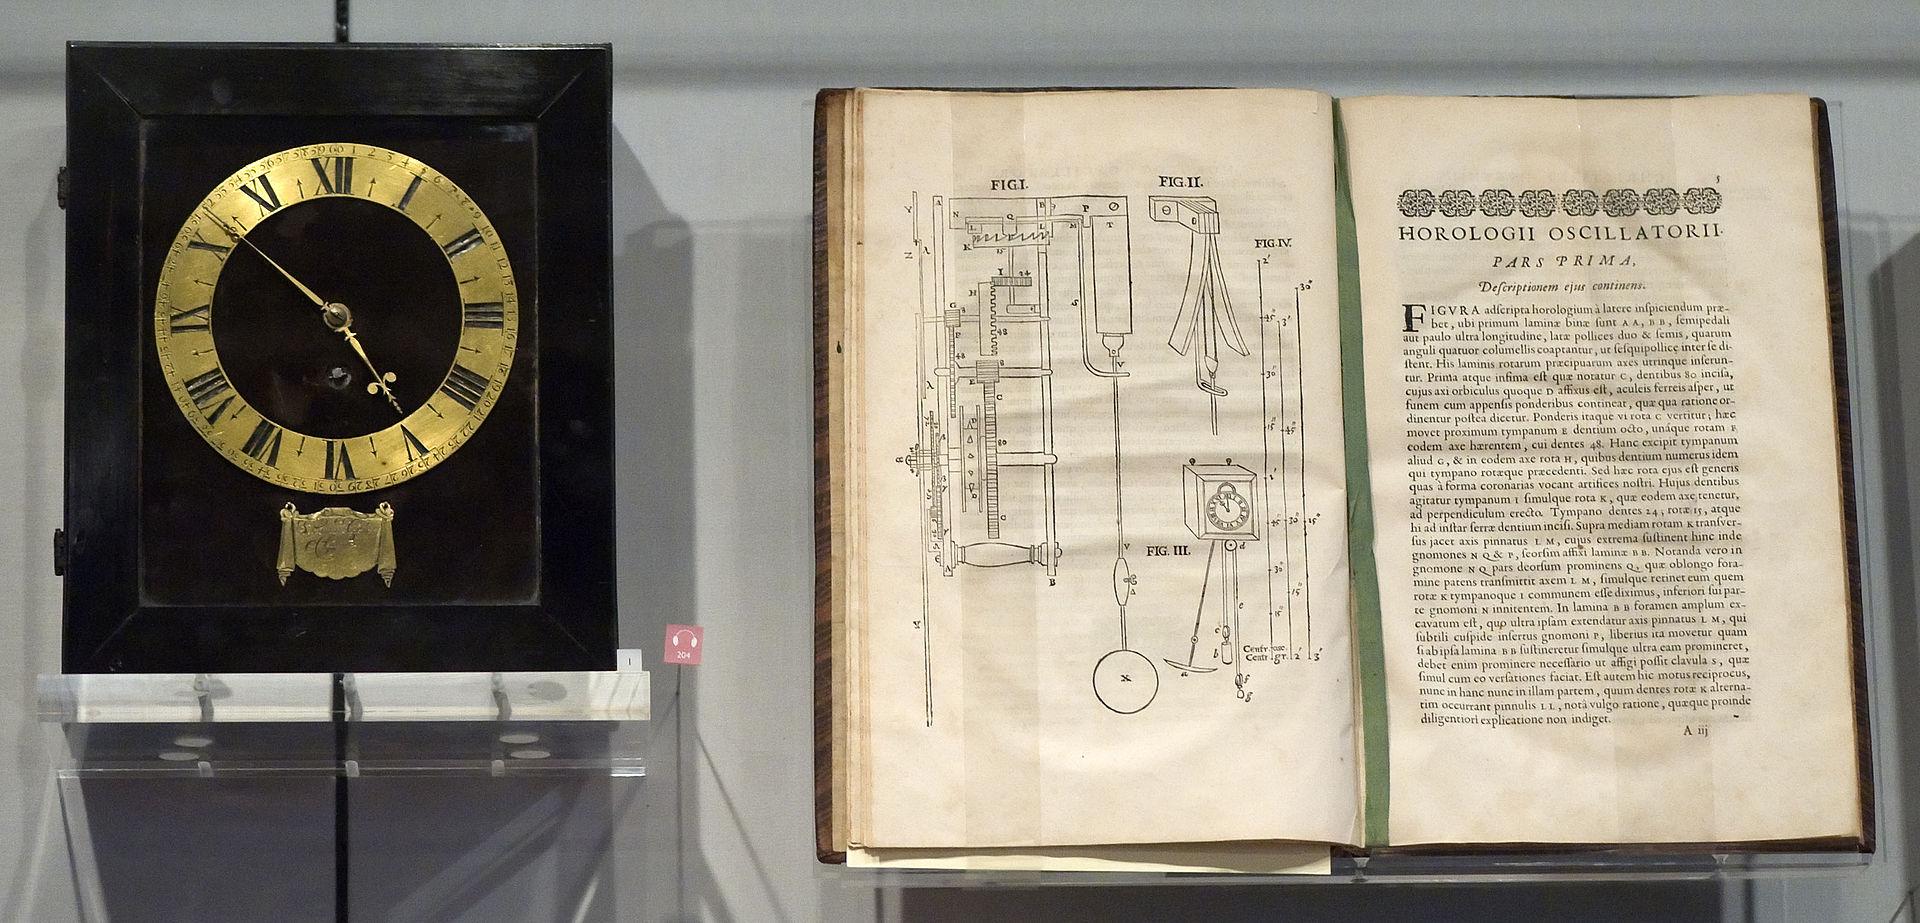 Christiaan_Huygens_Clock_and_Horologii_Oscillatorii.jpg